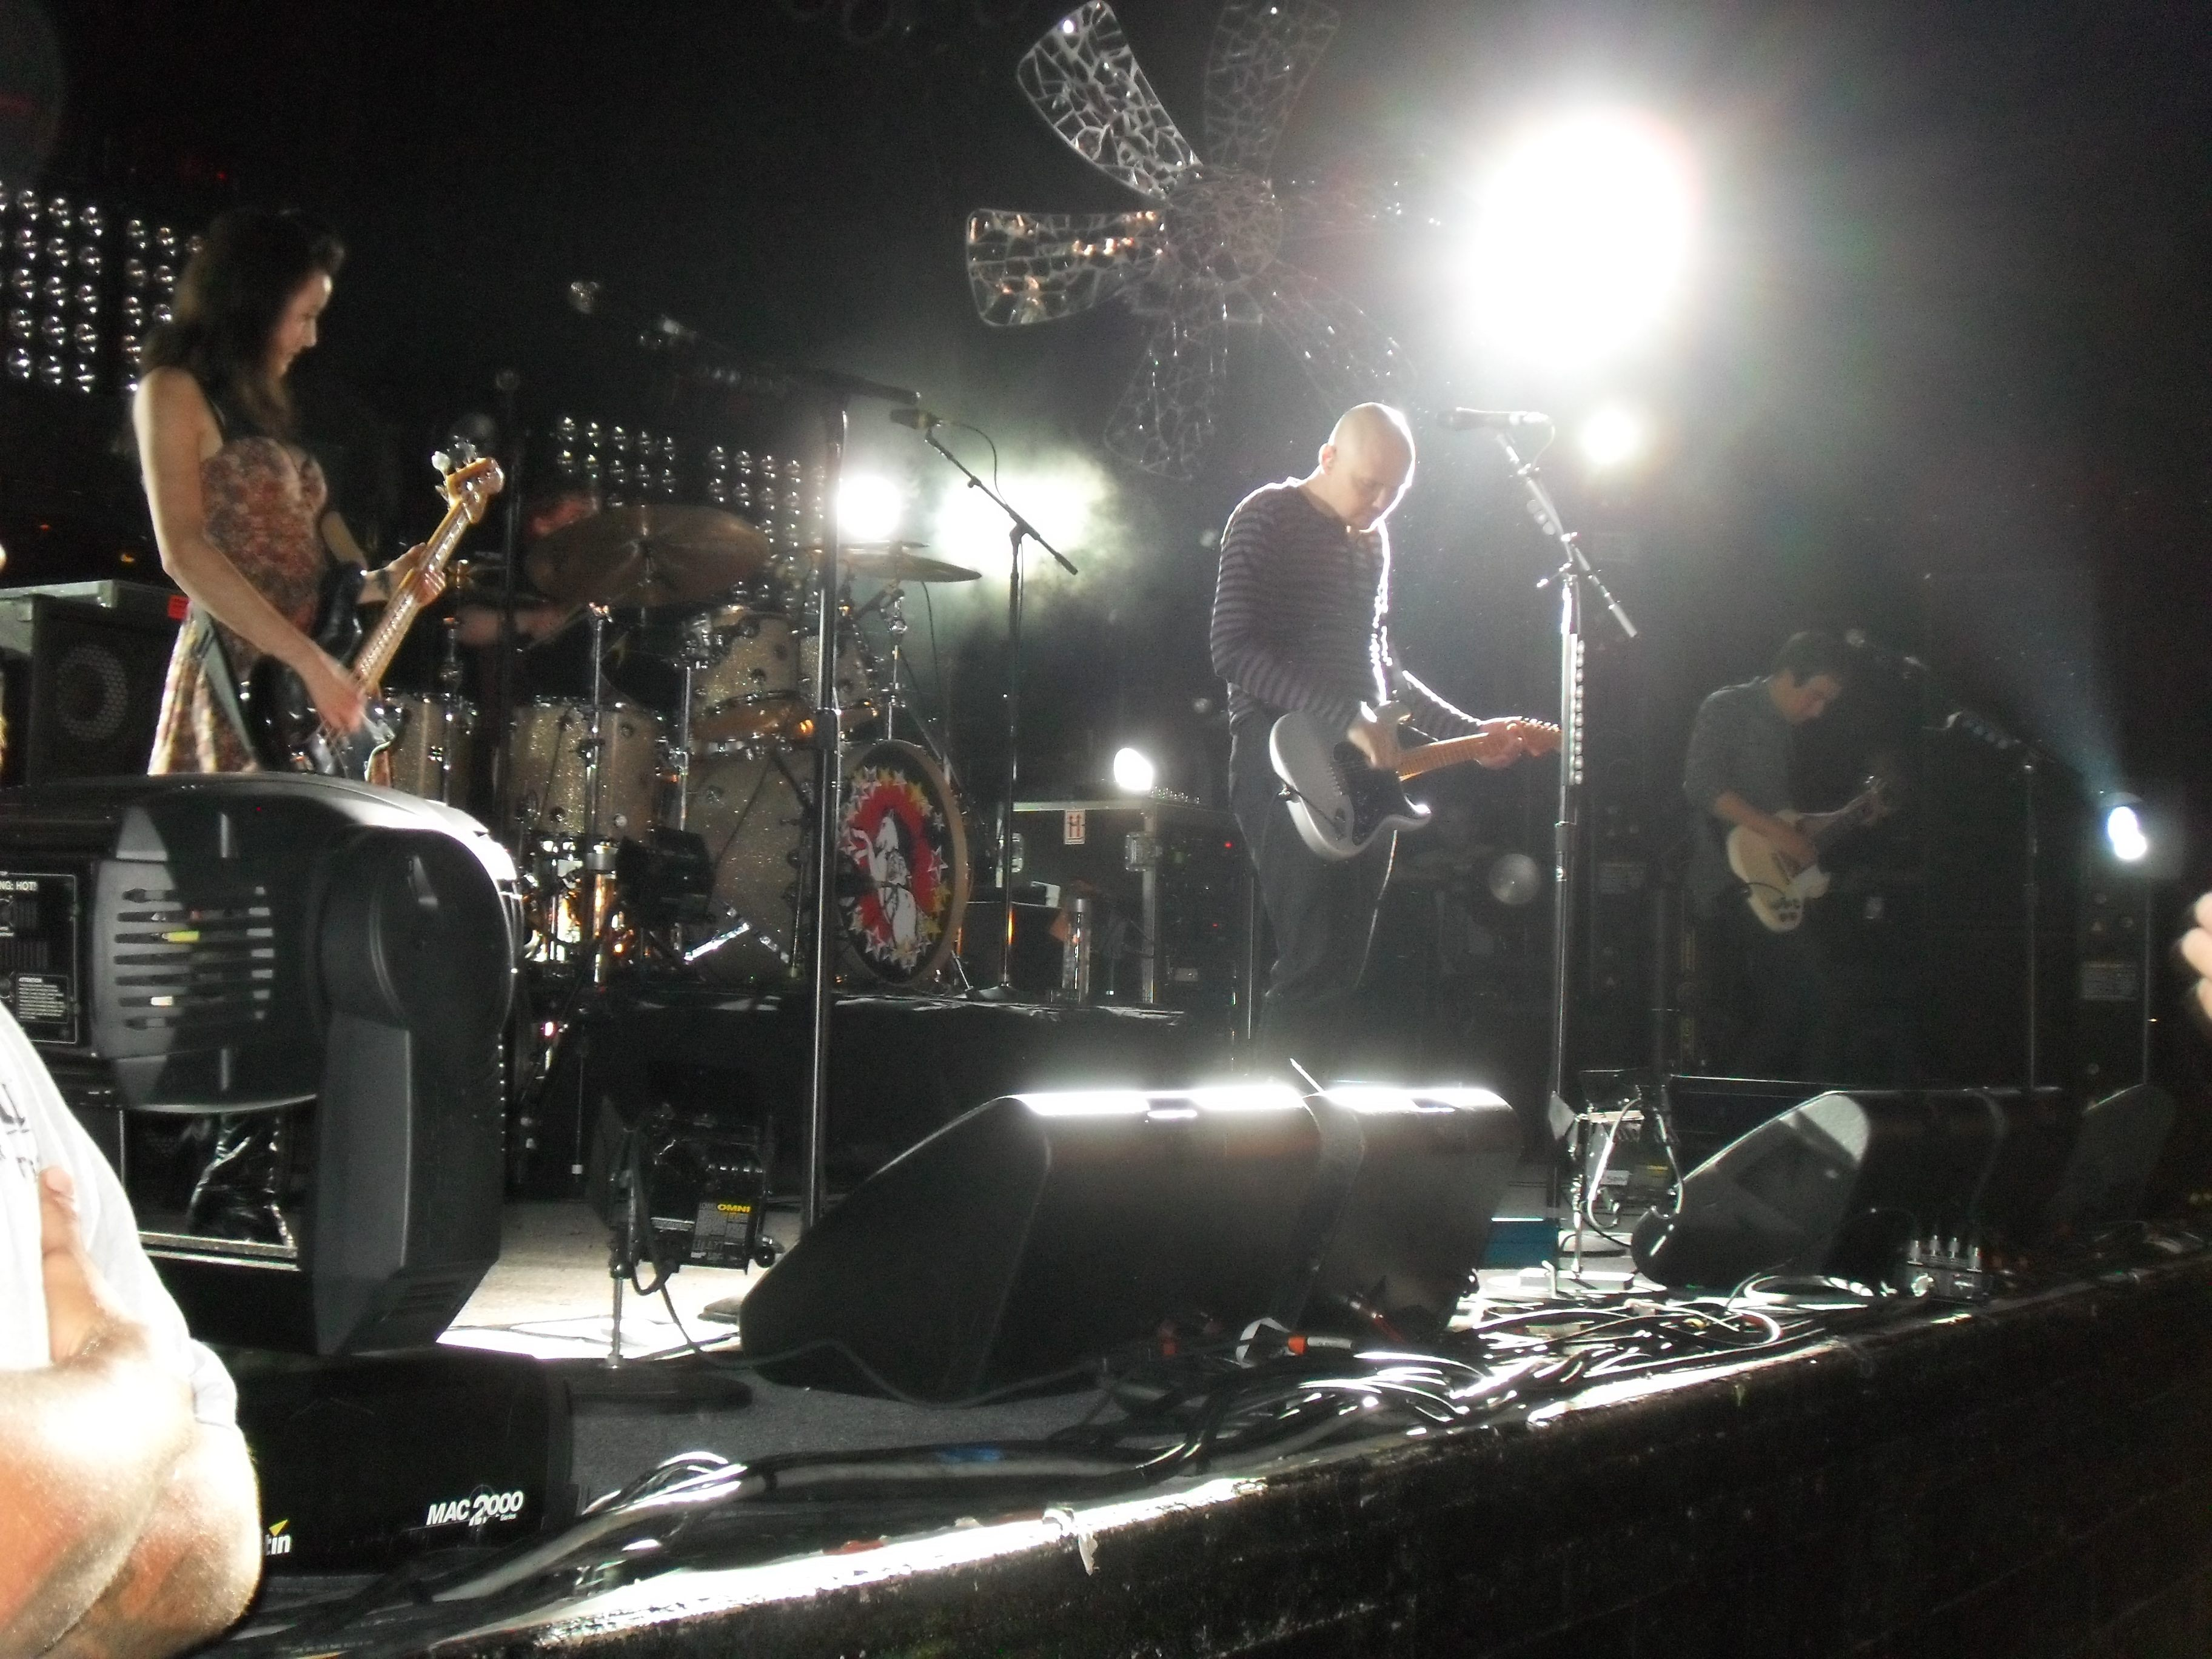 Tour De Lit Beige De Luxe List Of the Smashing Pumpkins Band Members